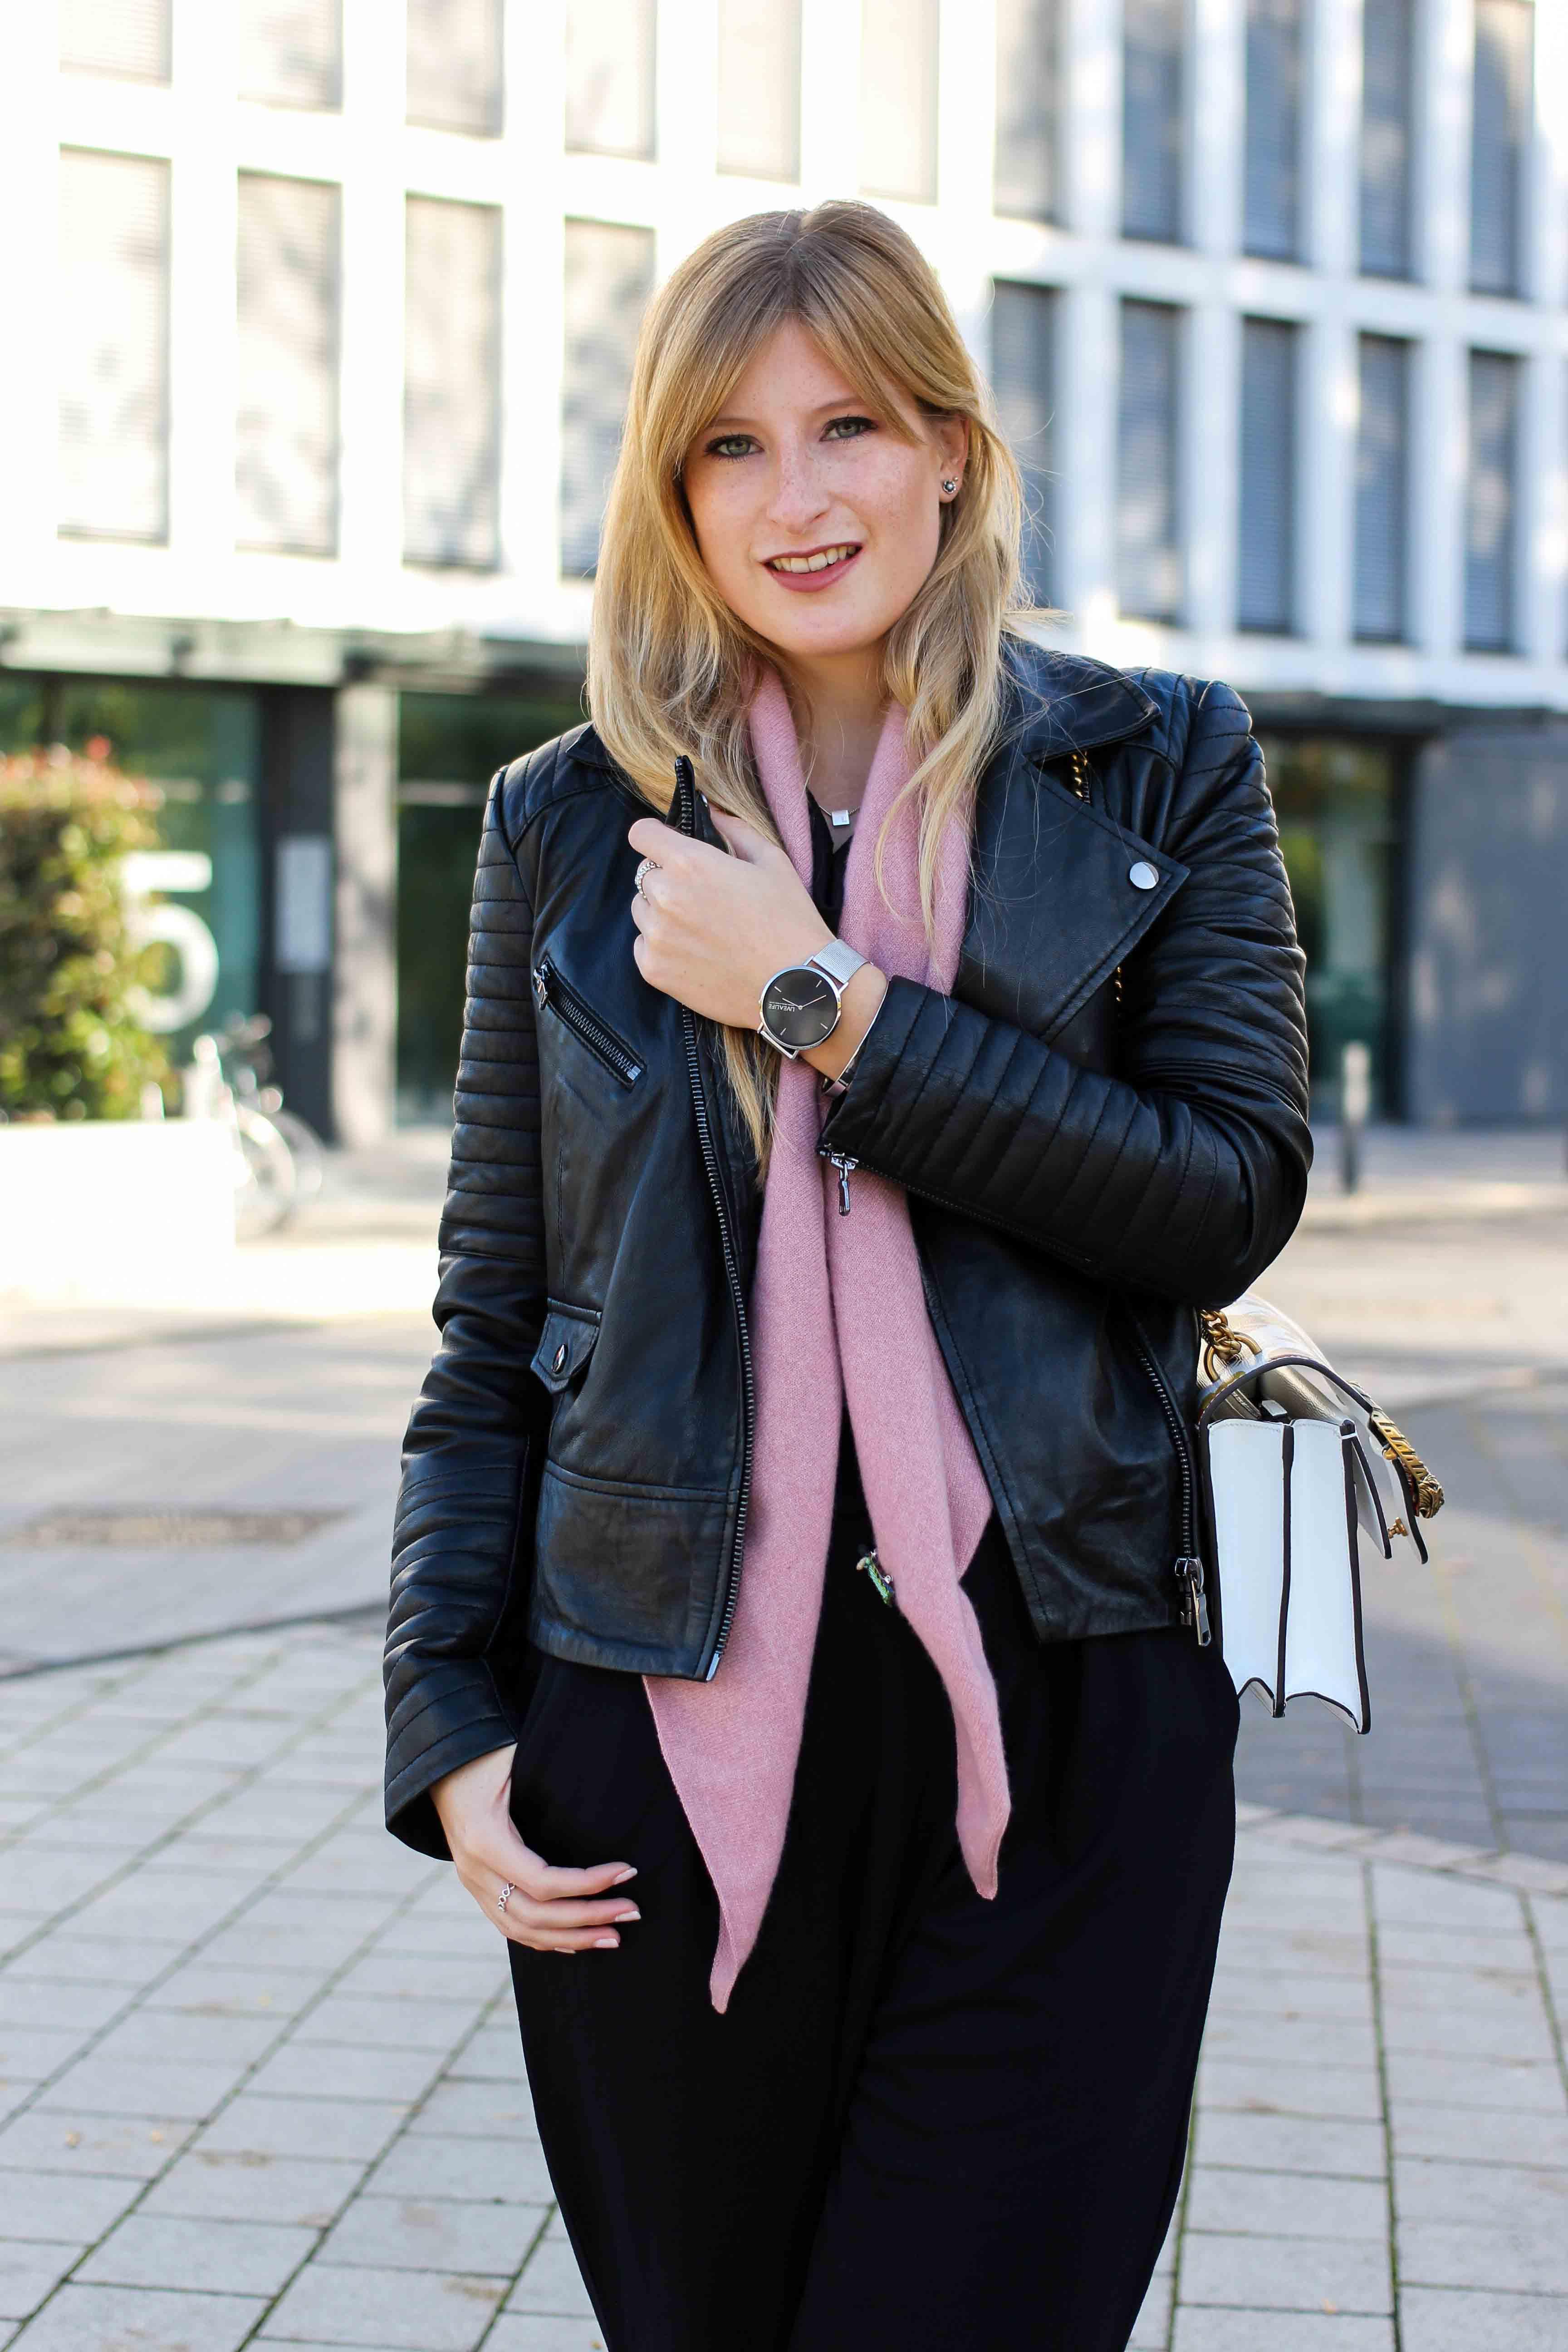 Schwarzer Jumpsuit rosa Kaschmir Schal Gucci Dionysus Garden Print Lederjacke Modeblog Outfit Herbsttrend 6